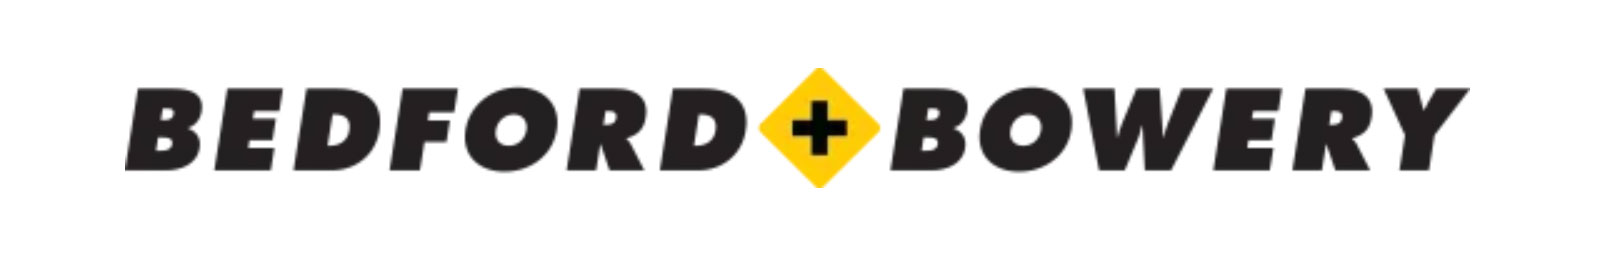 Bedford + Bowery logo